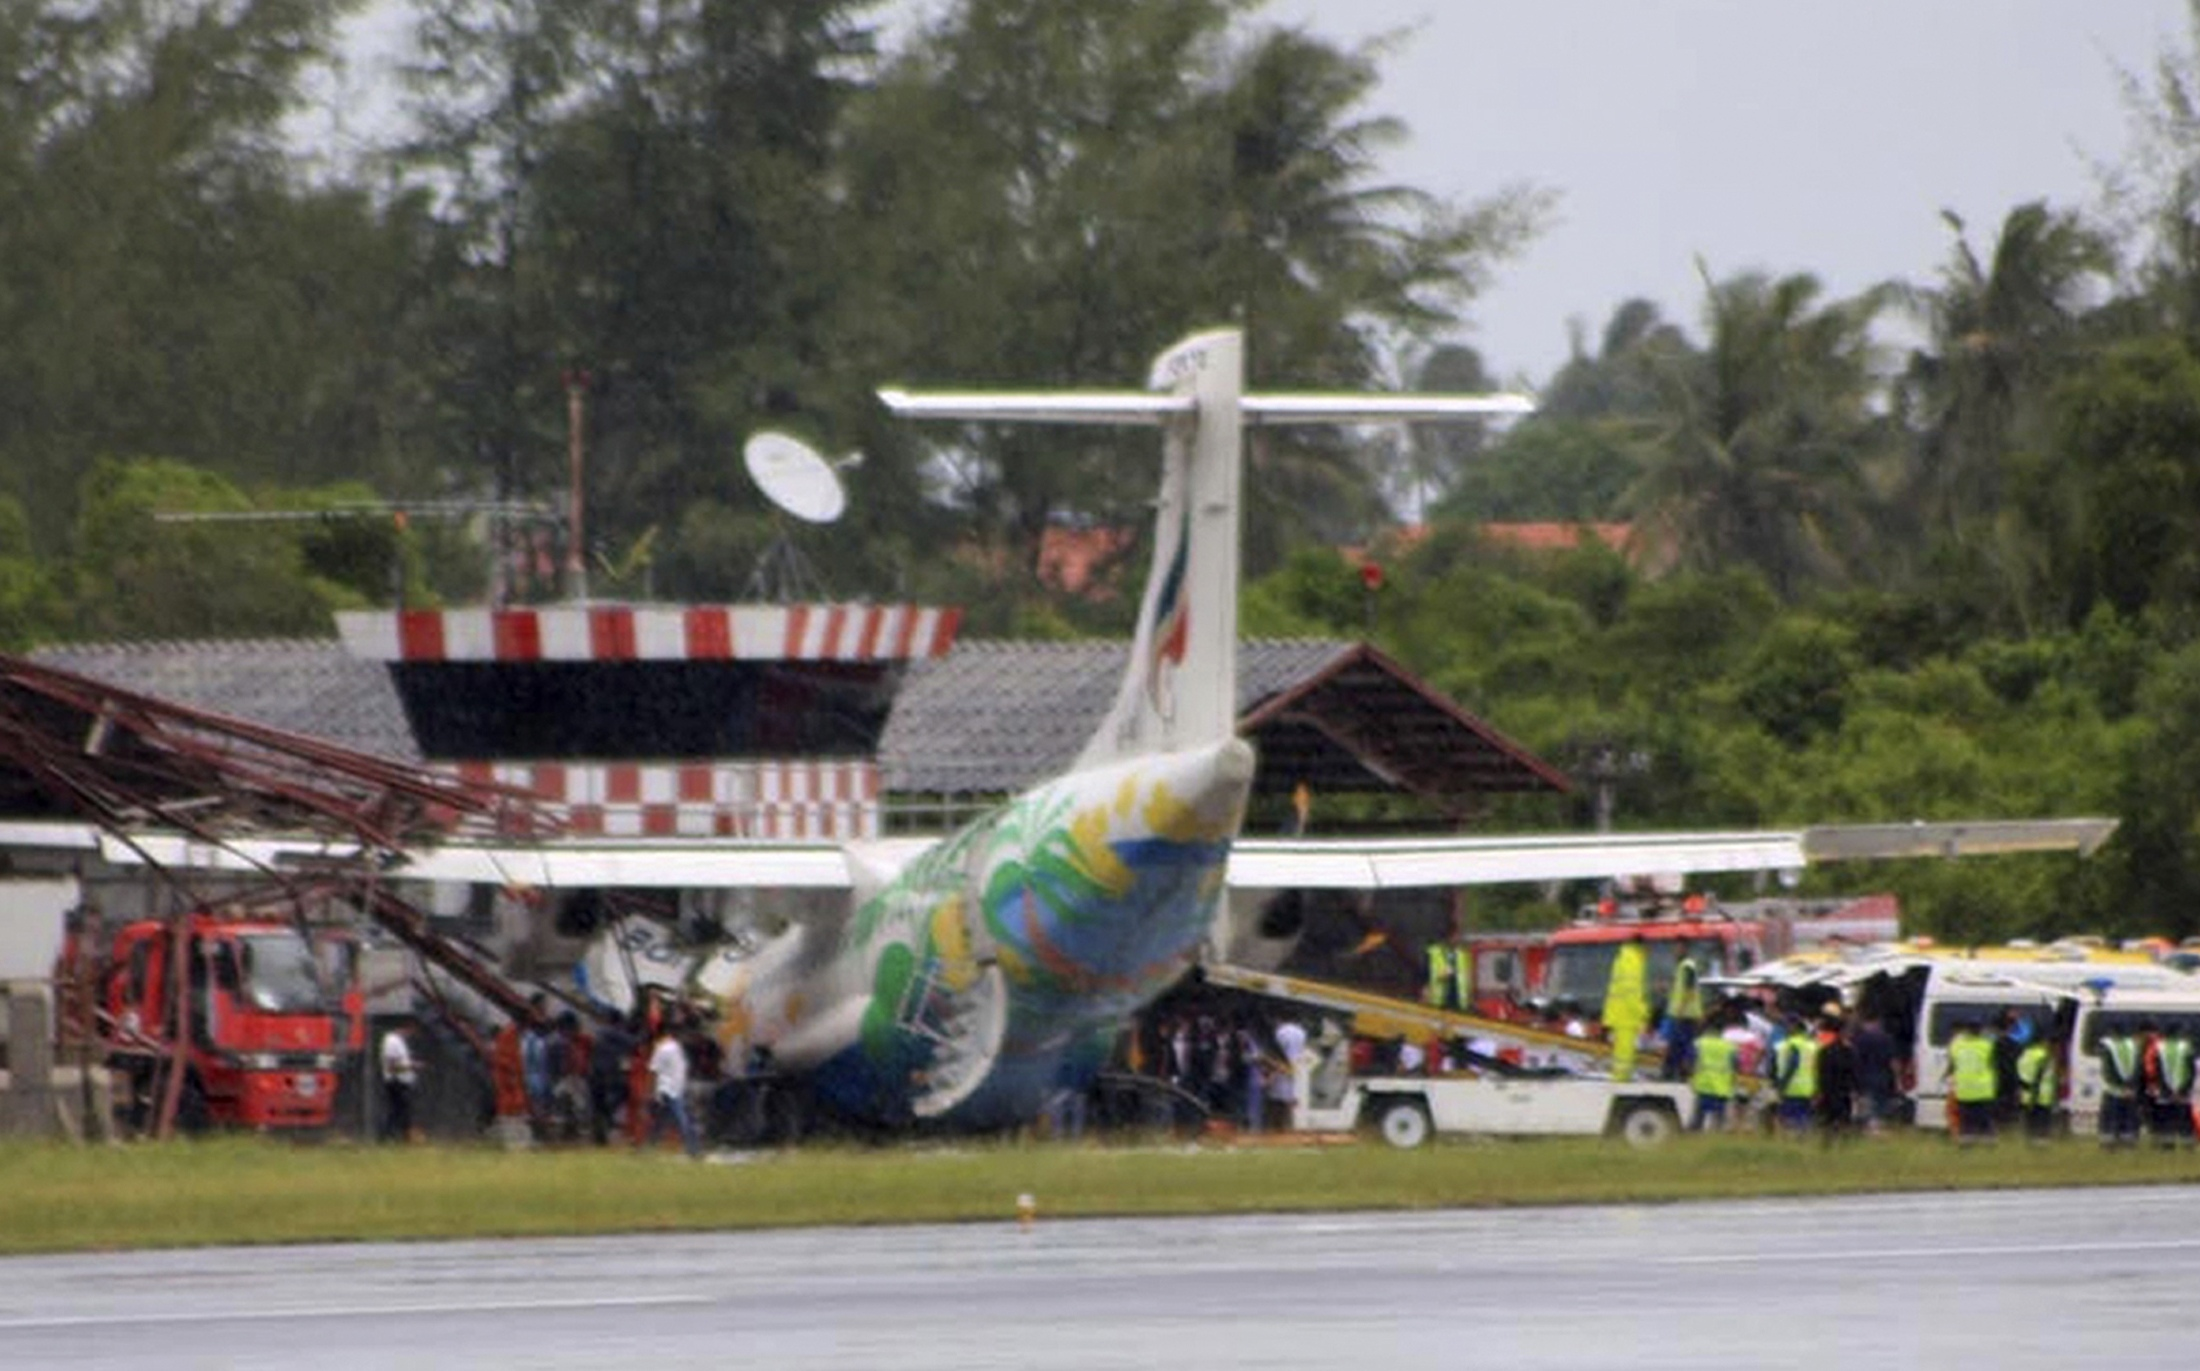 Aeroporto Koh Samui : Thailandia schianto aereo sull isola di koh samui tra i